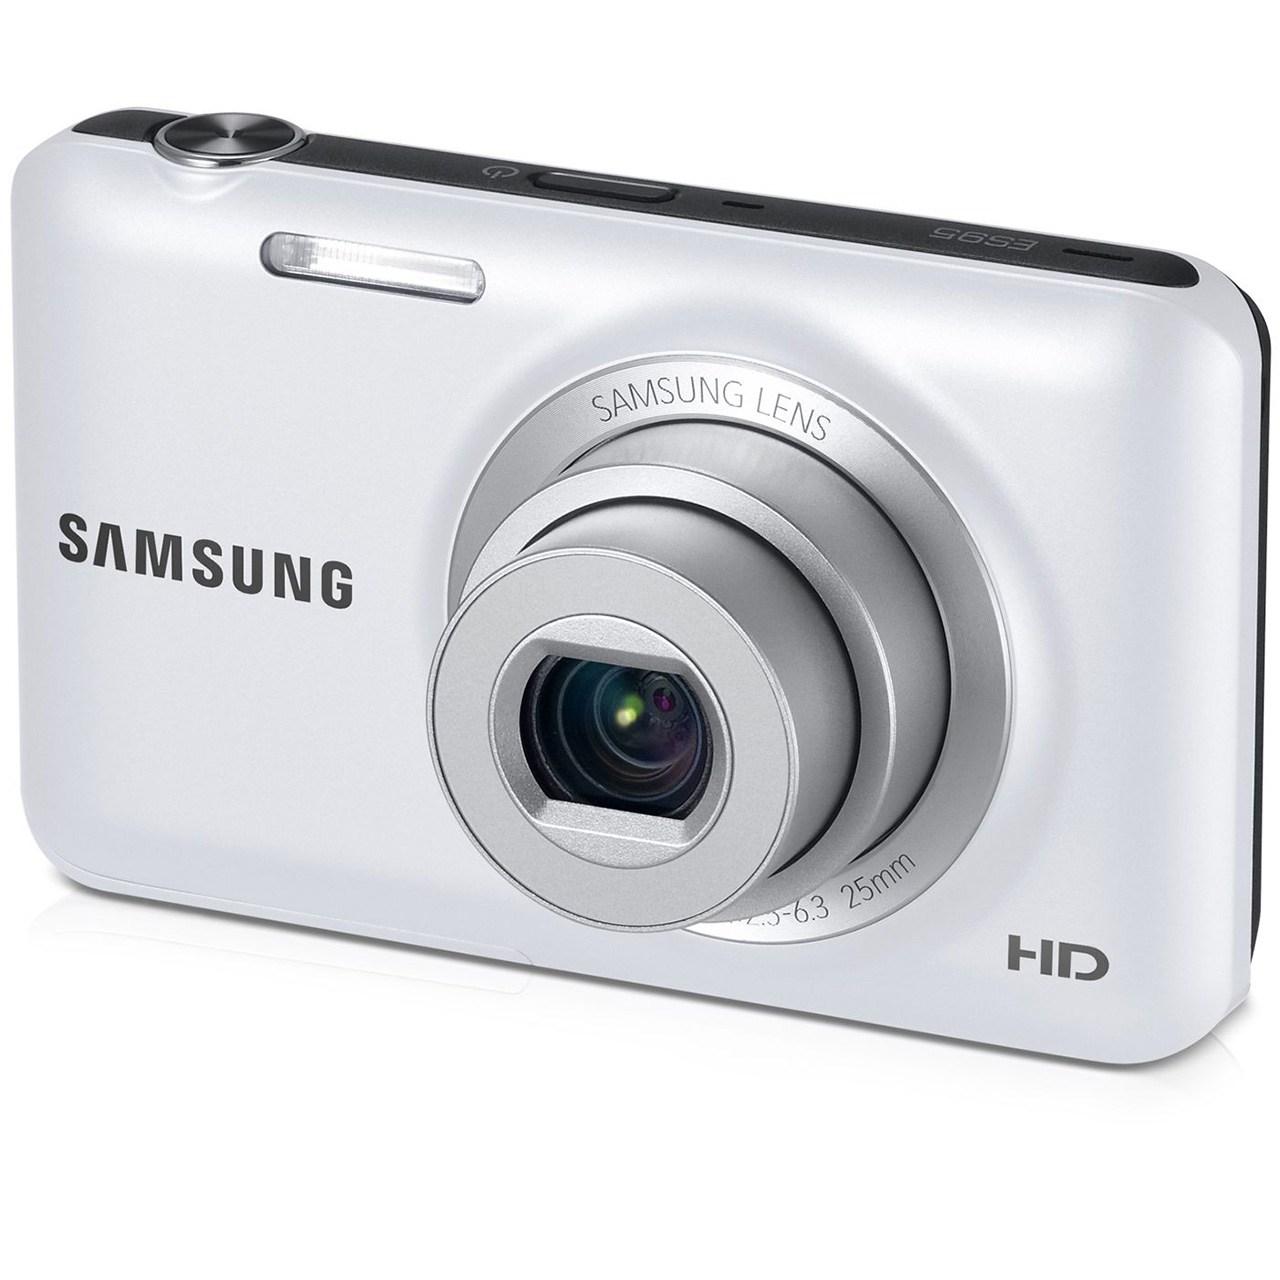 دوربين ديجيتال سامسونگ مدل Samsung ES95 Digital Camera